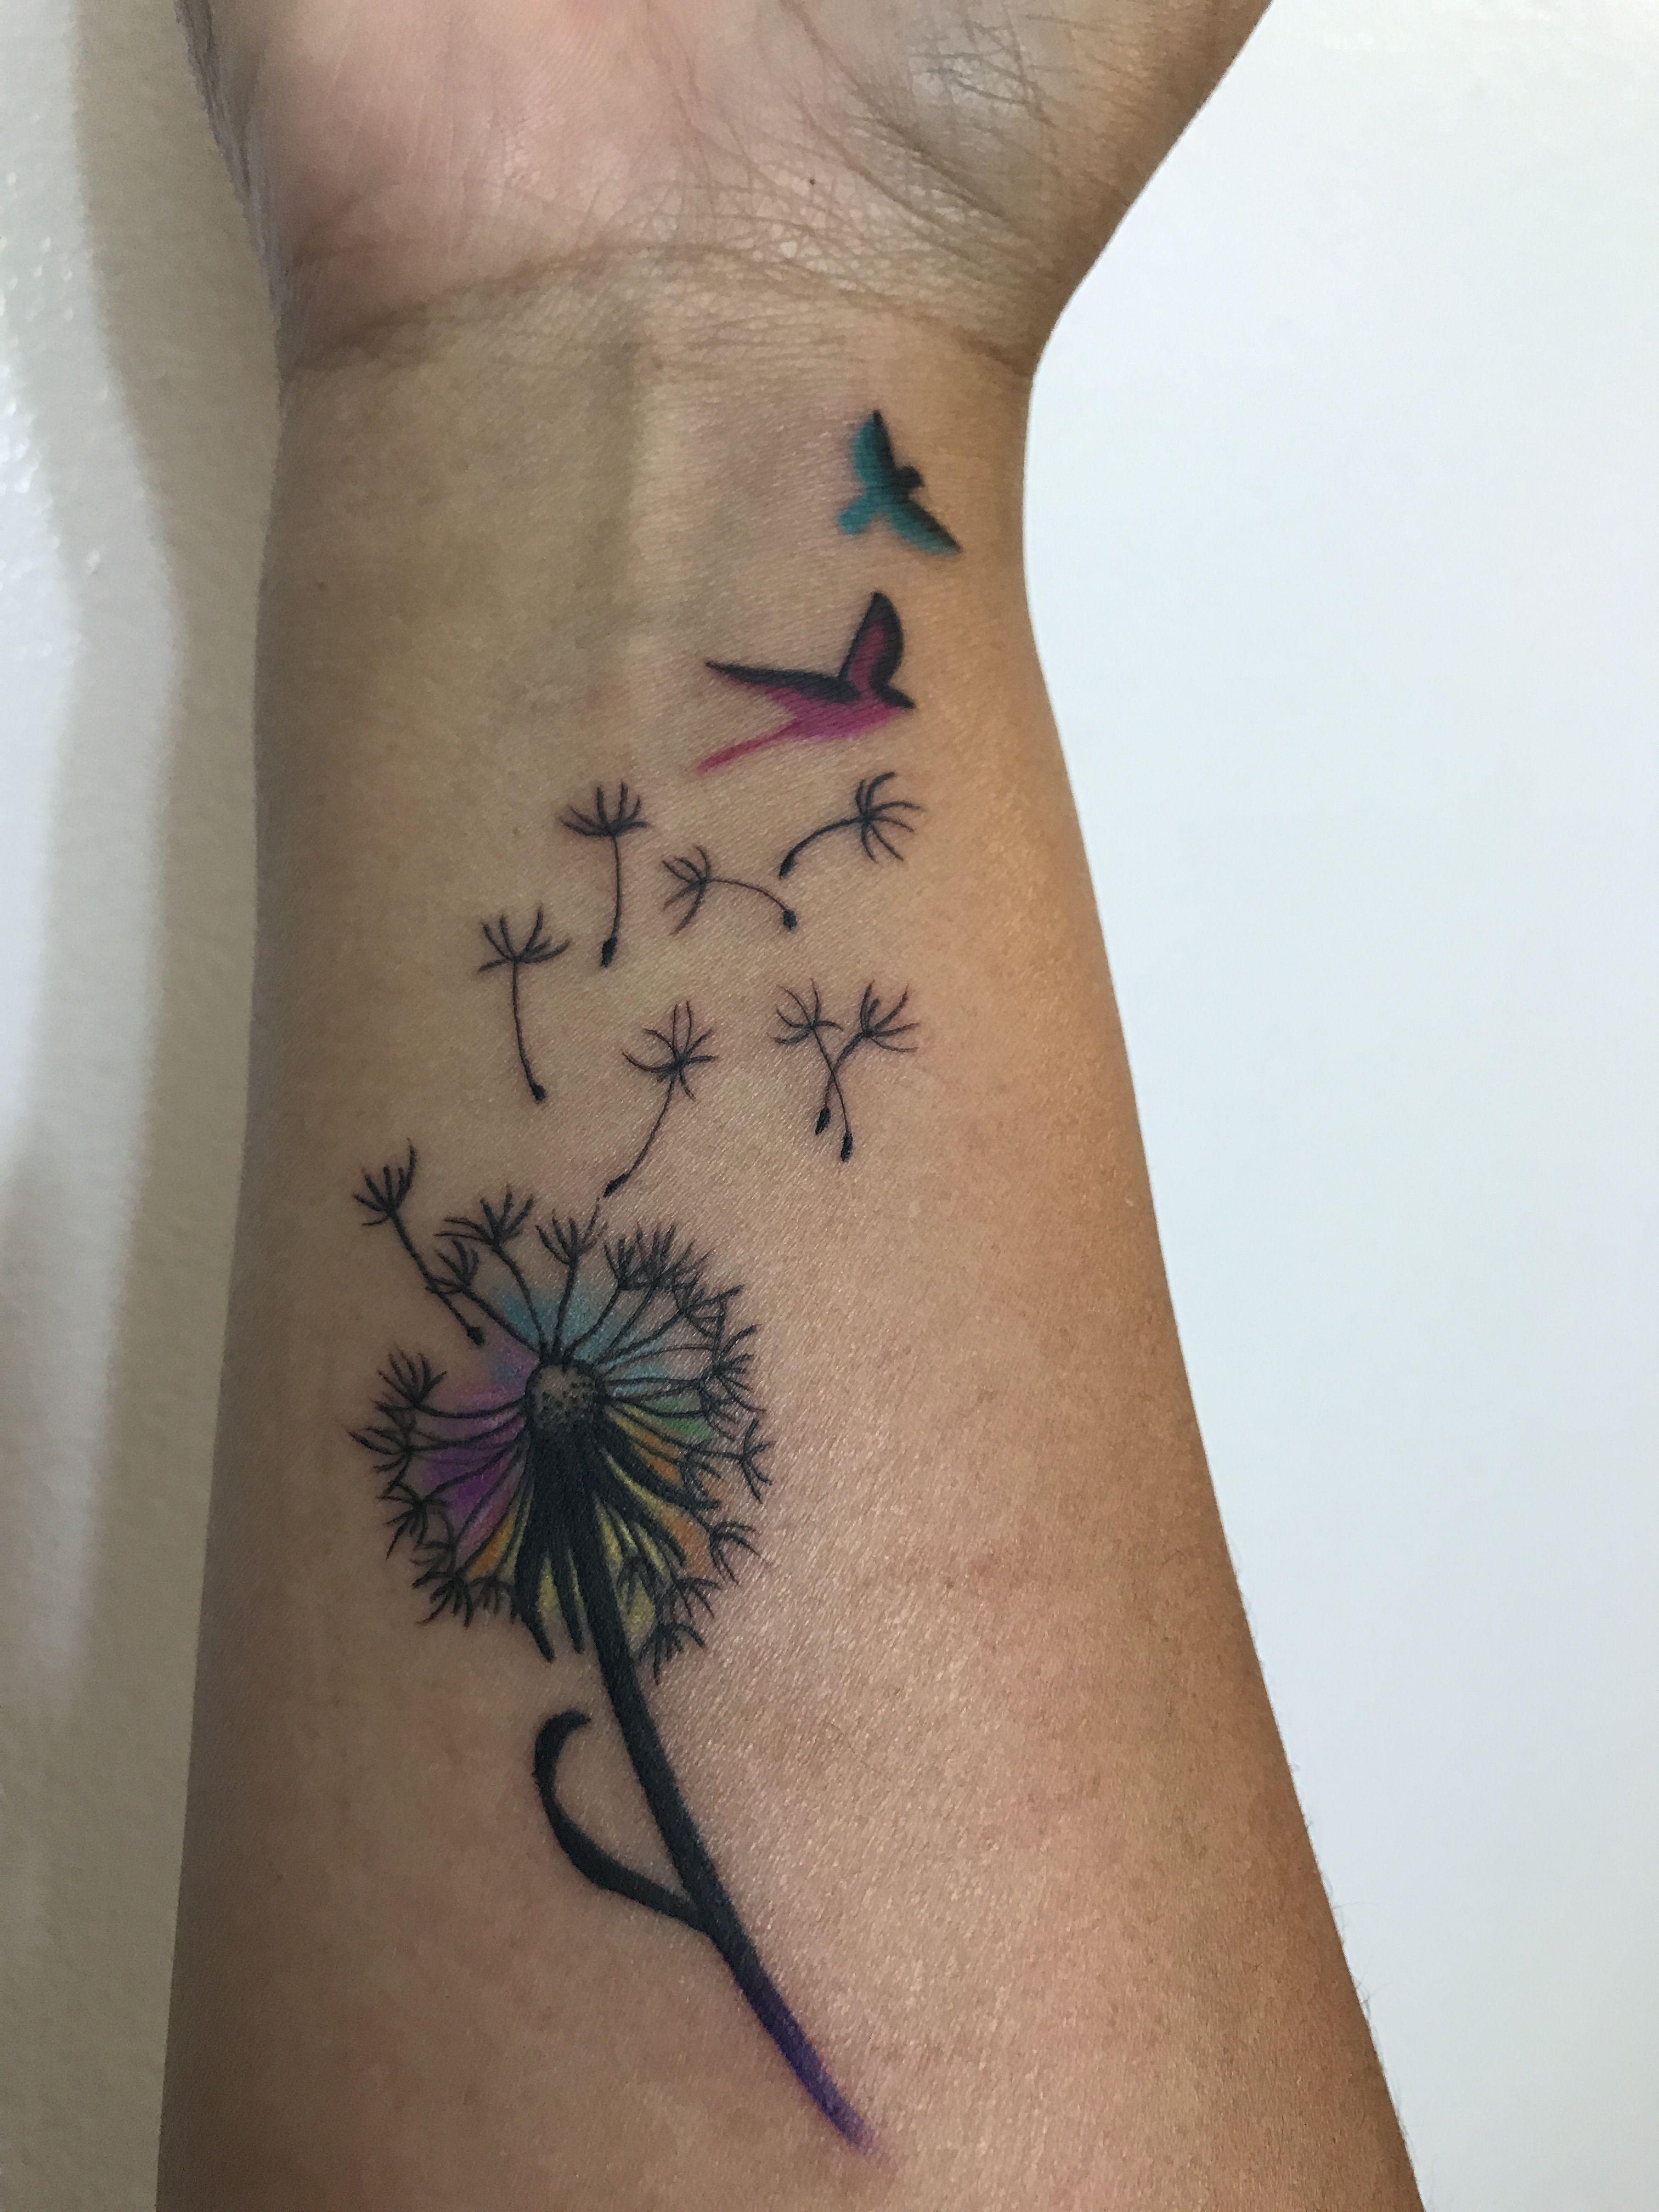 Dandelion Puff Tattoo On Wrist Wrist Tattoos Tattoos Dandelion